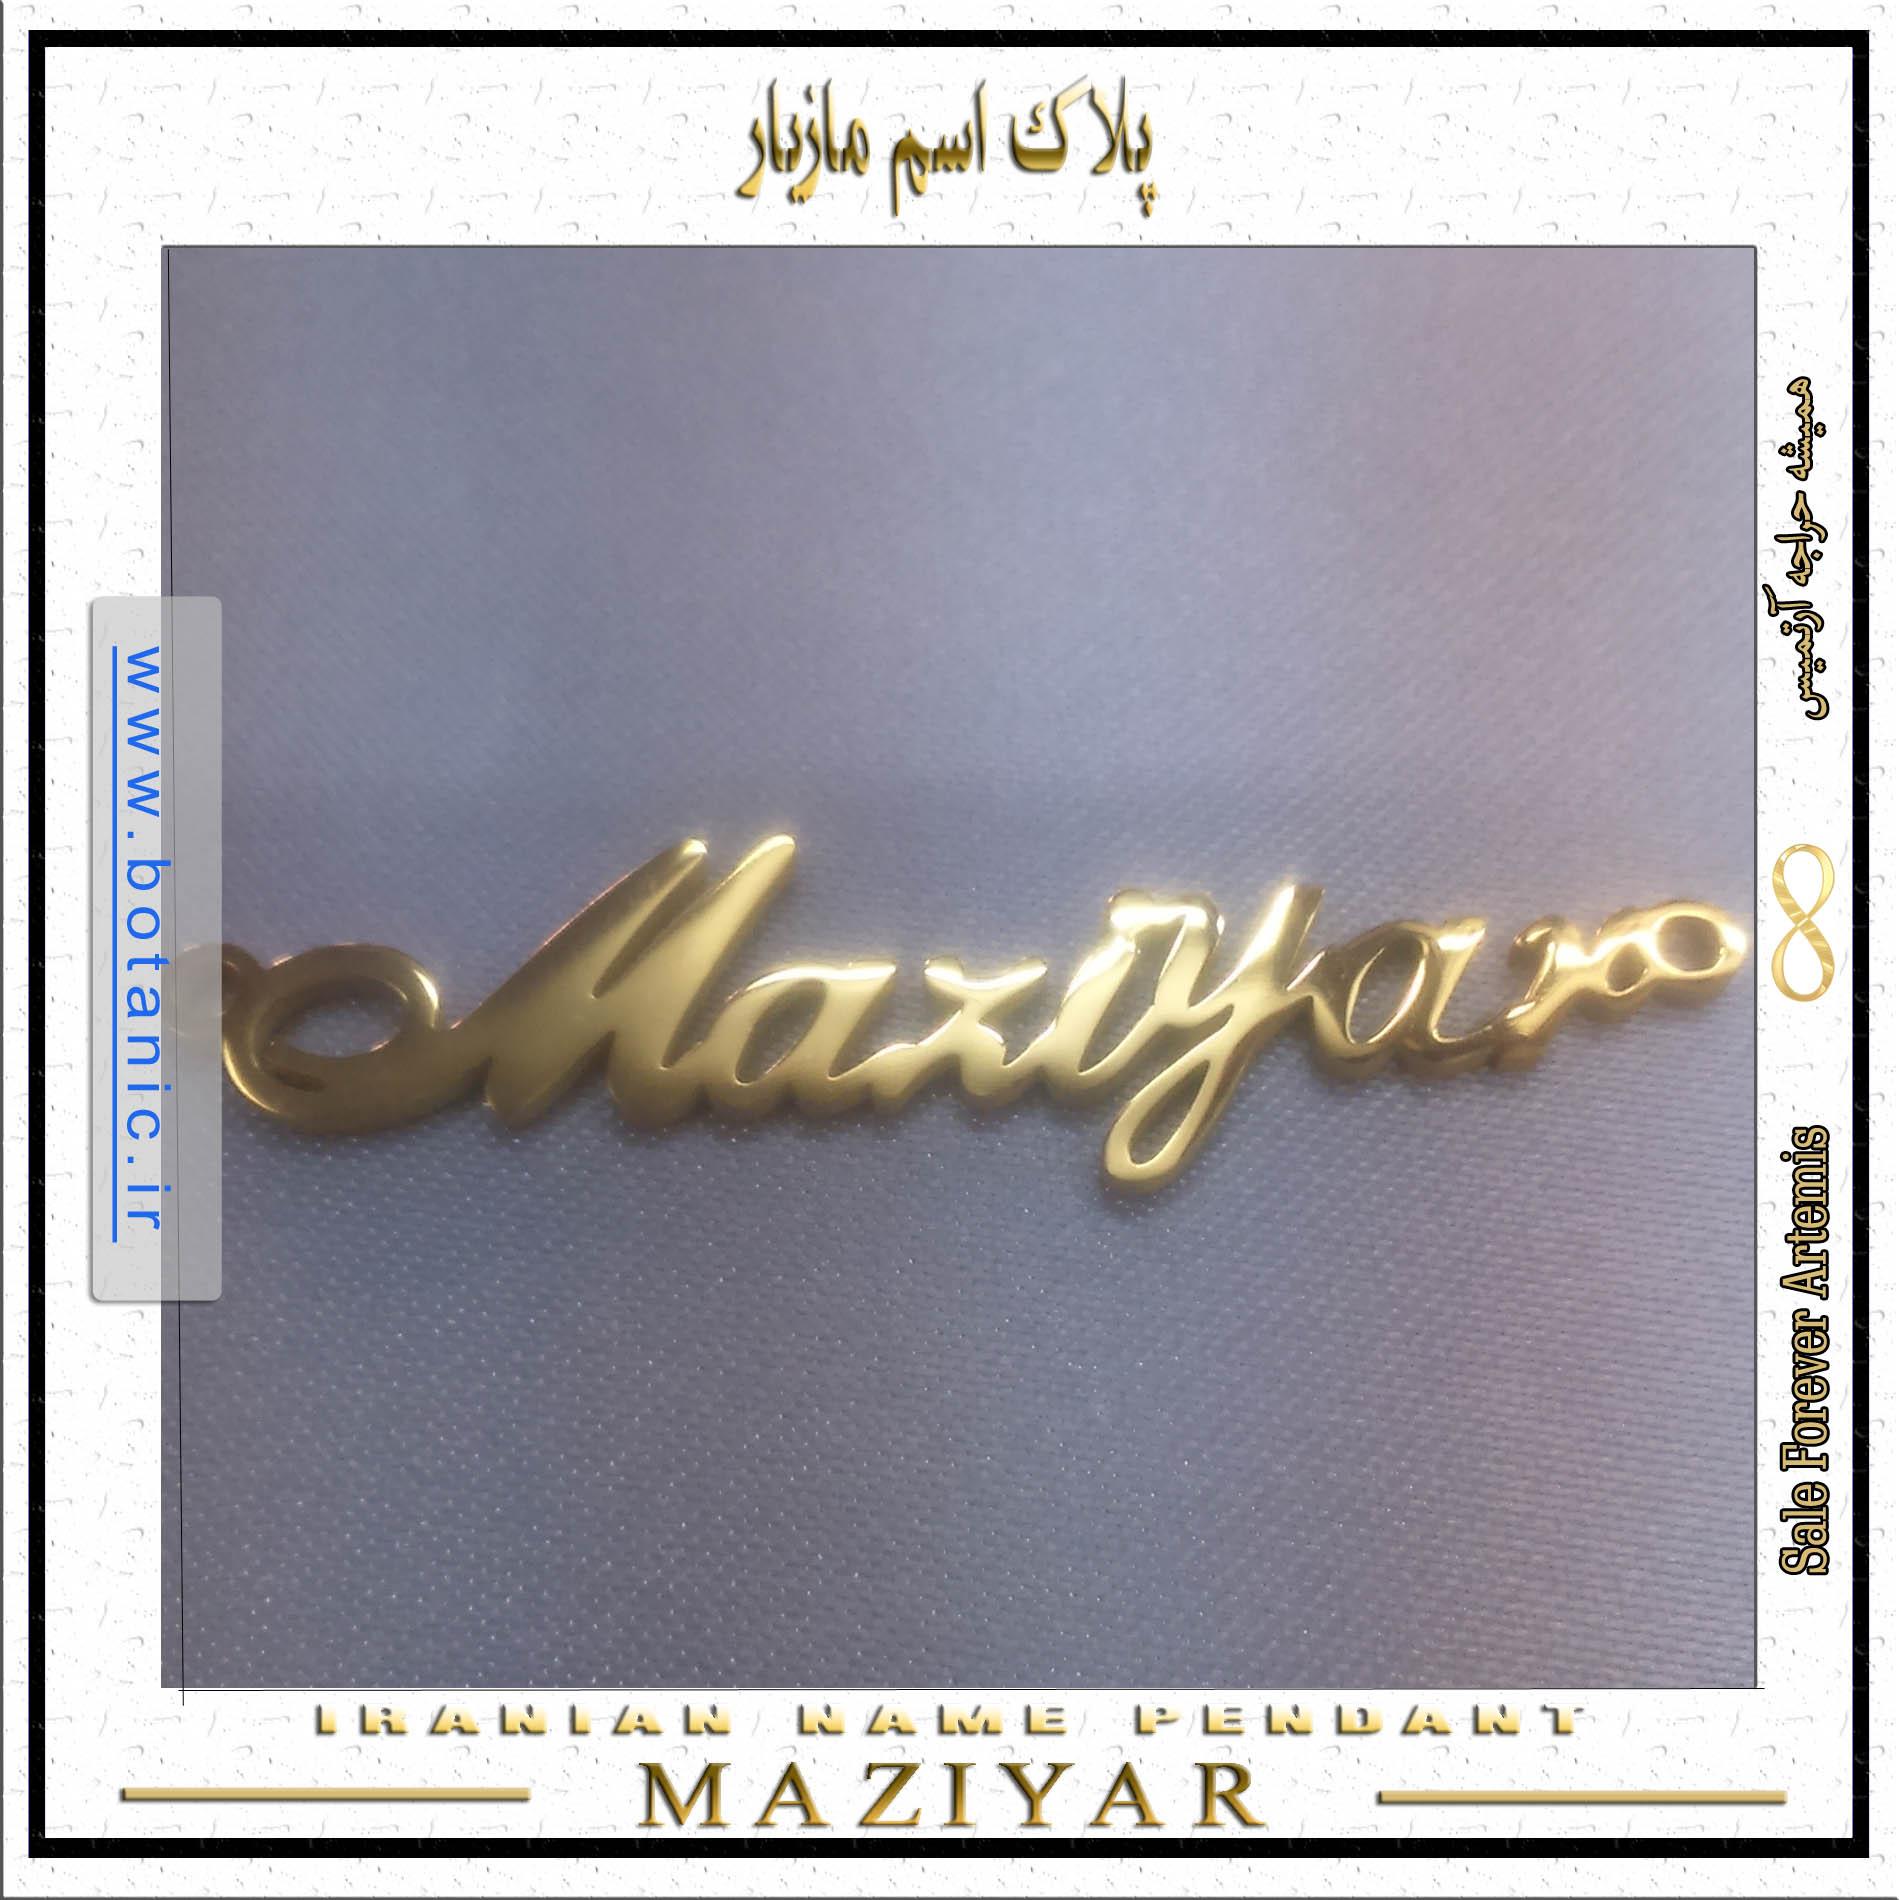 Iranian Name Pendant Maziyar